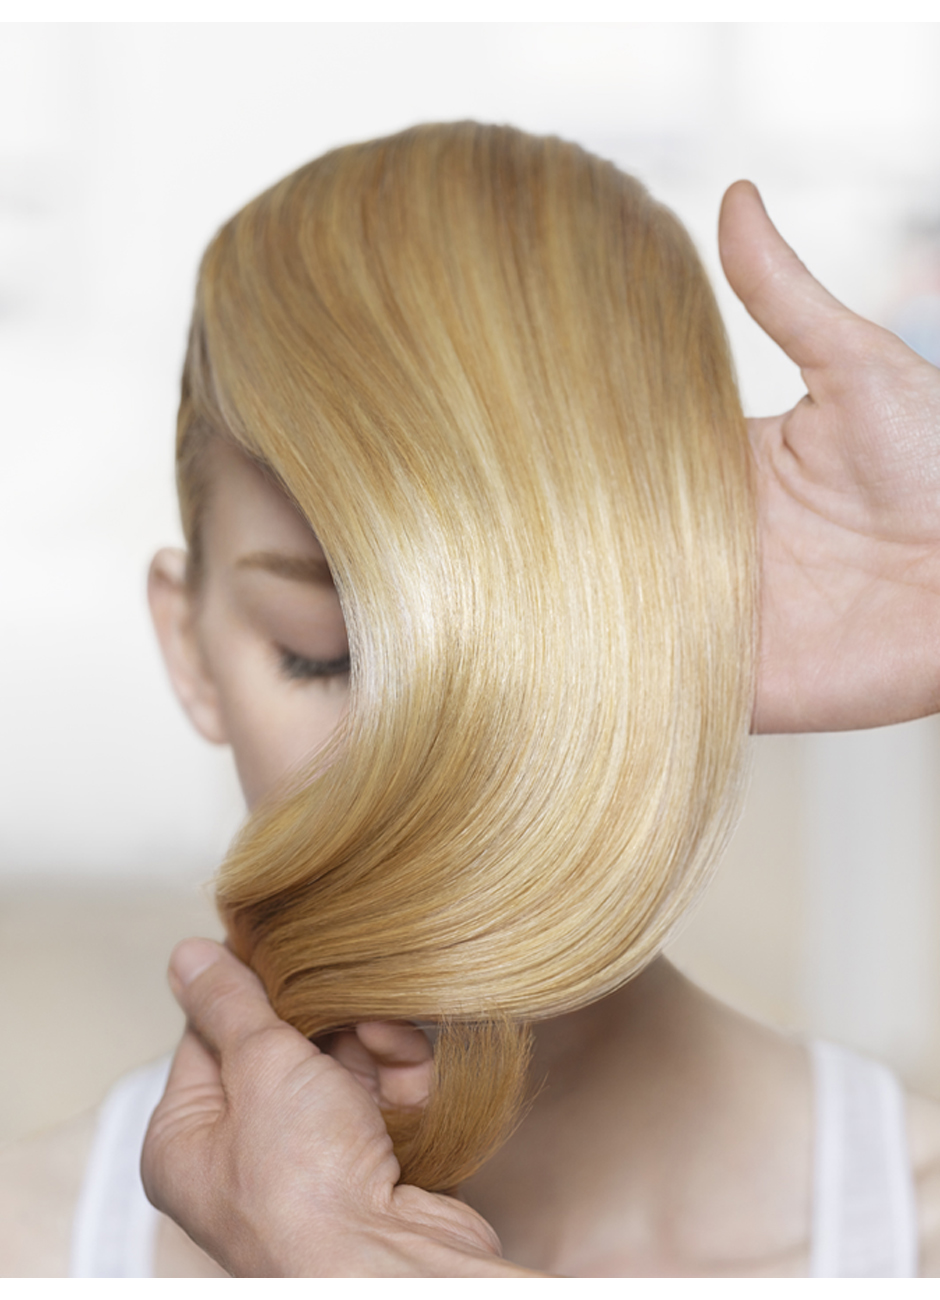 Repair Nutrition Profiber Hair Result Image